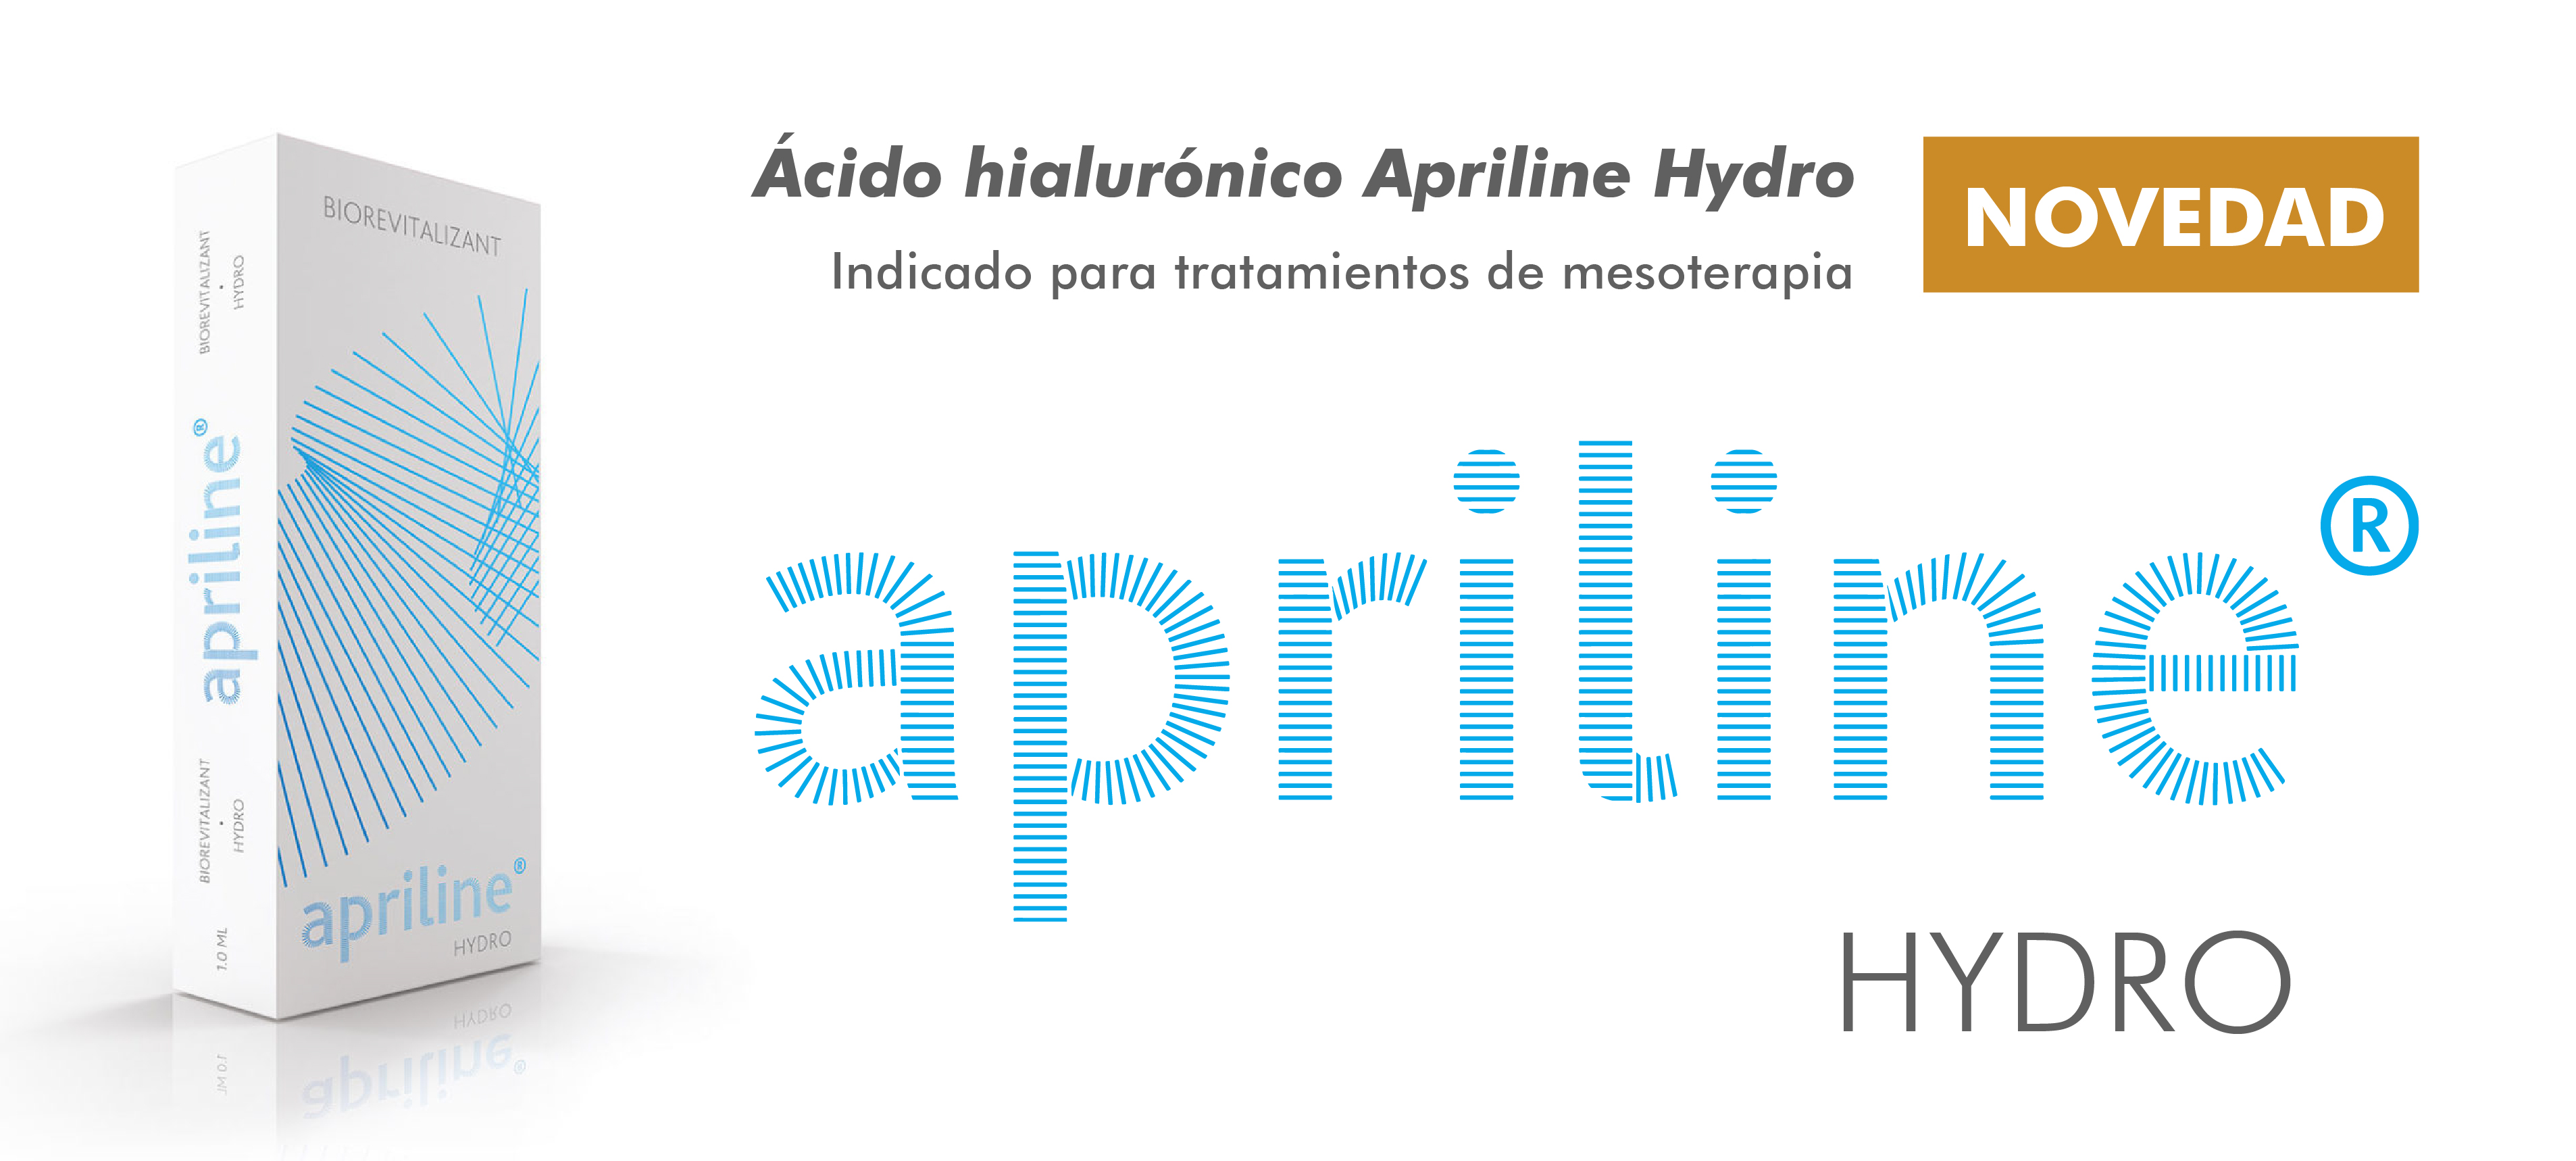 Ácido hialurónico Apriline Hydro